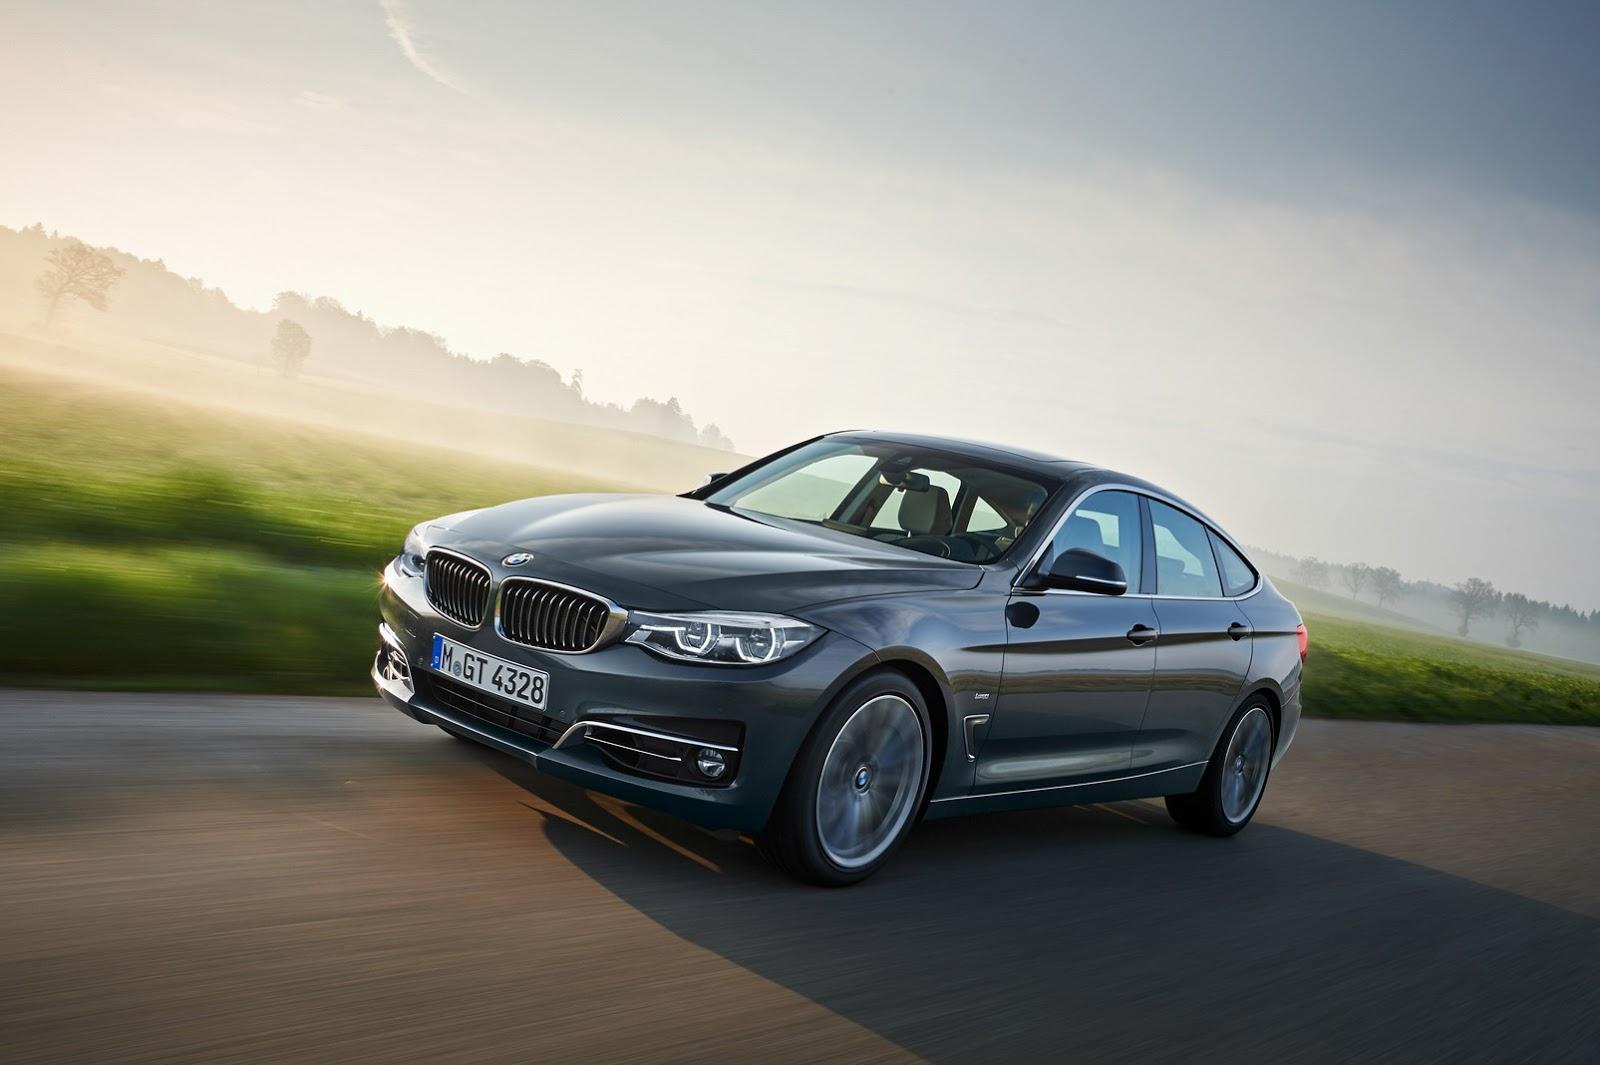 2017 BMW 3-Series Gran Turismo Facelift Detailed In 60 ...